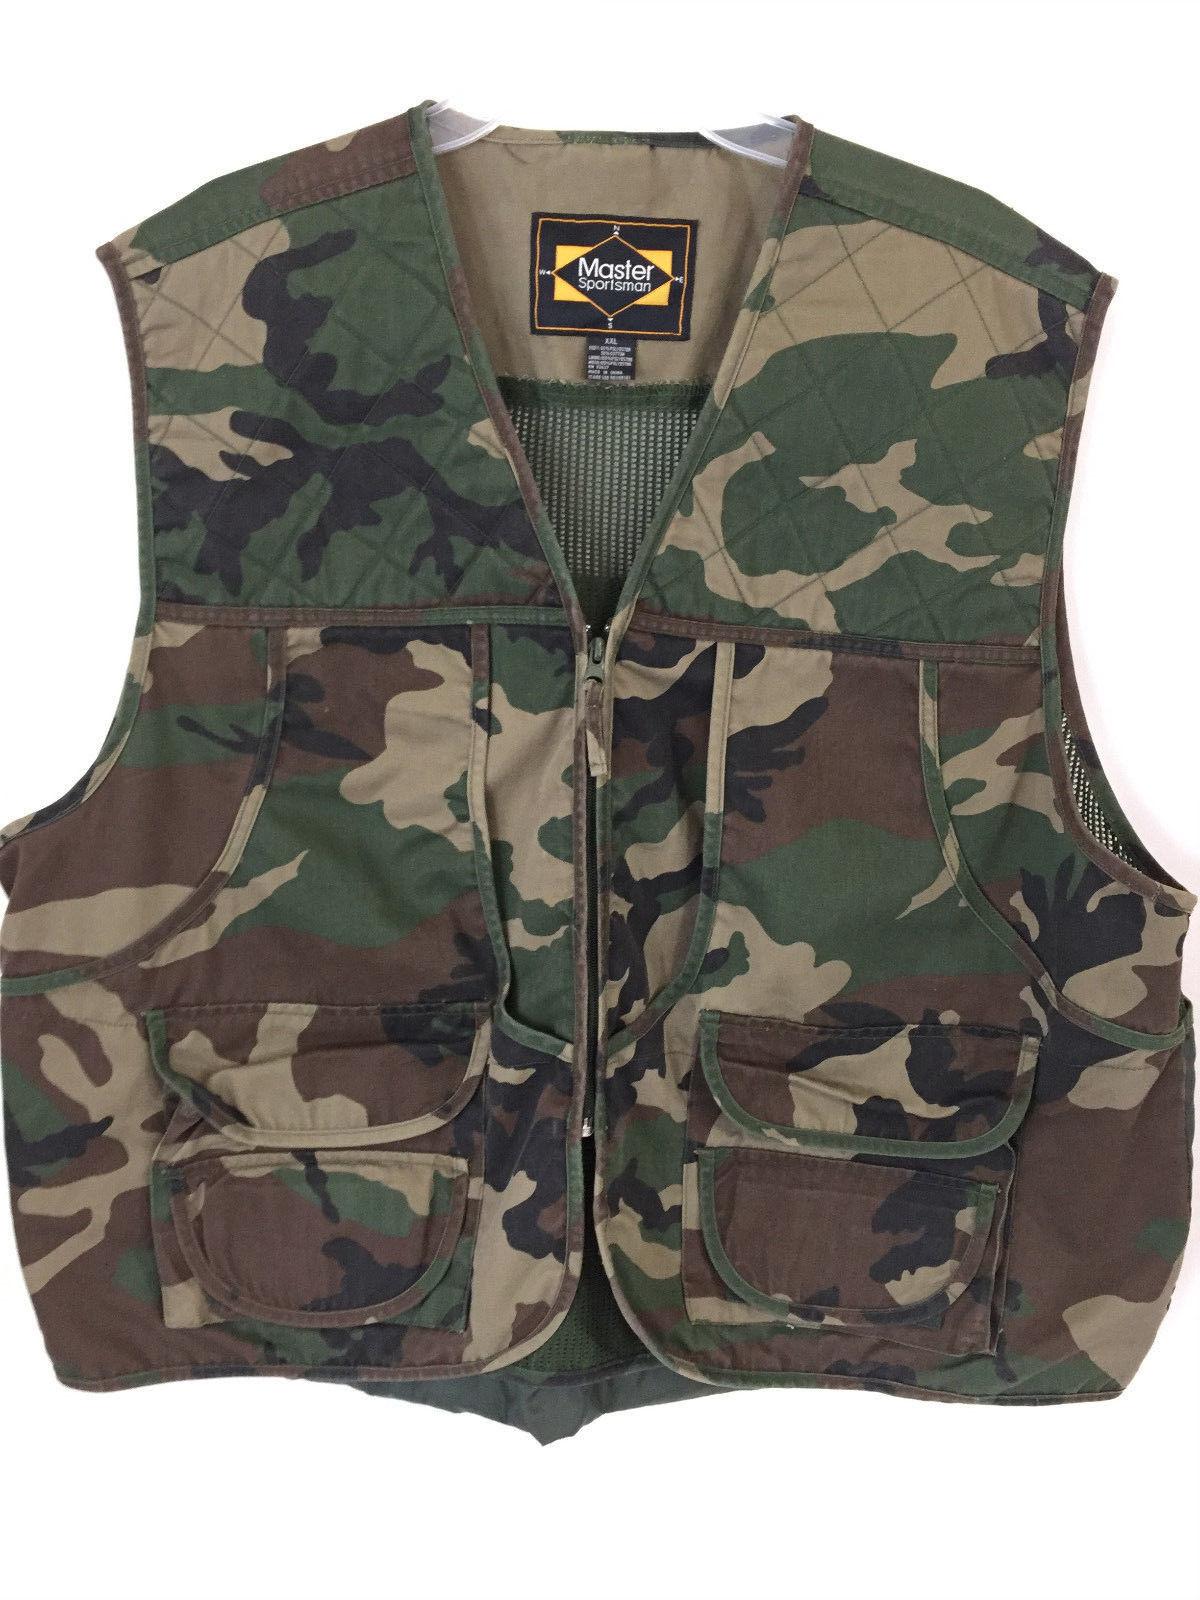 d7ec74dfe58b8 Master Sportsman Hunters Camo Vest XXL and 50 similar items. 57